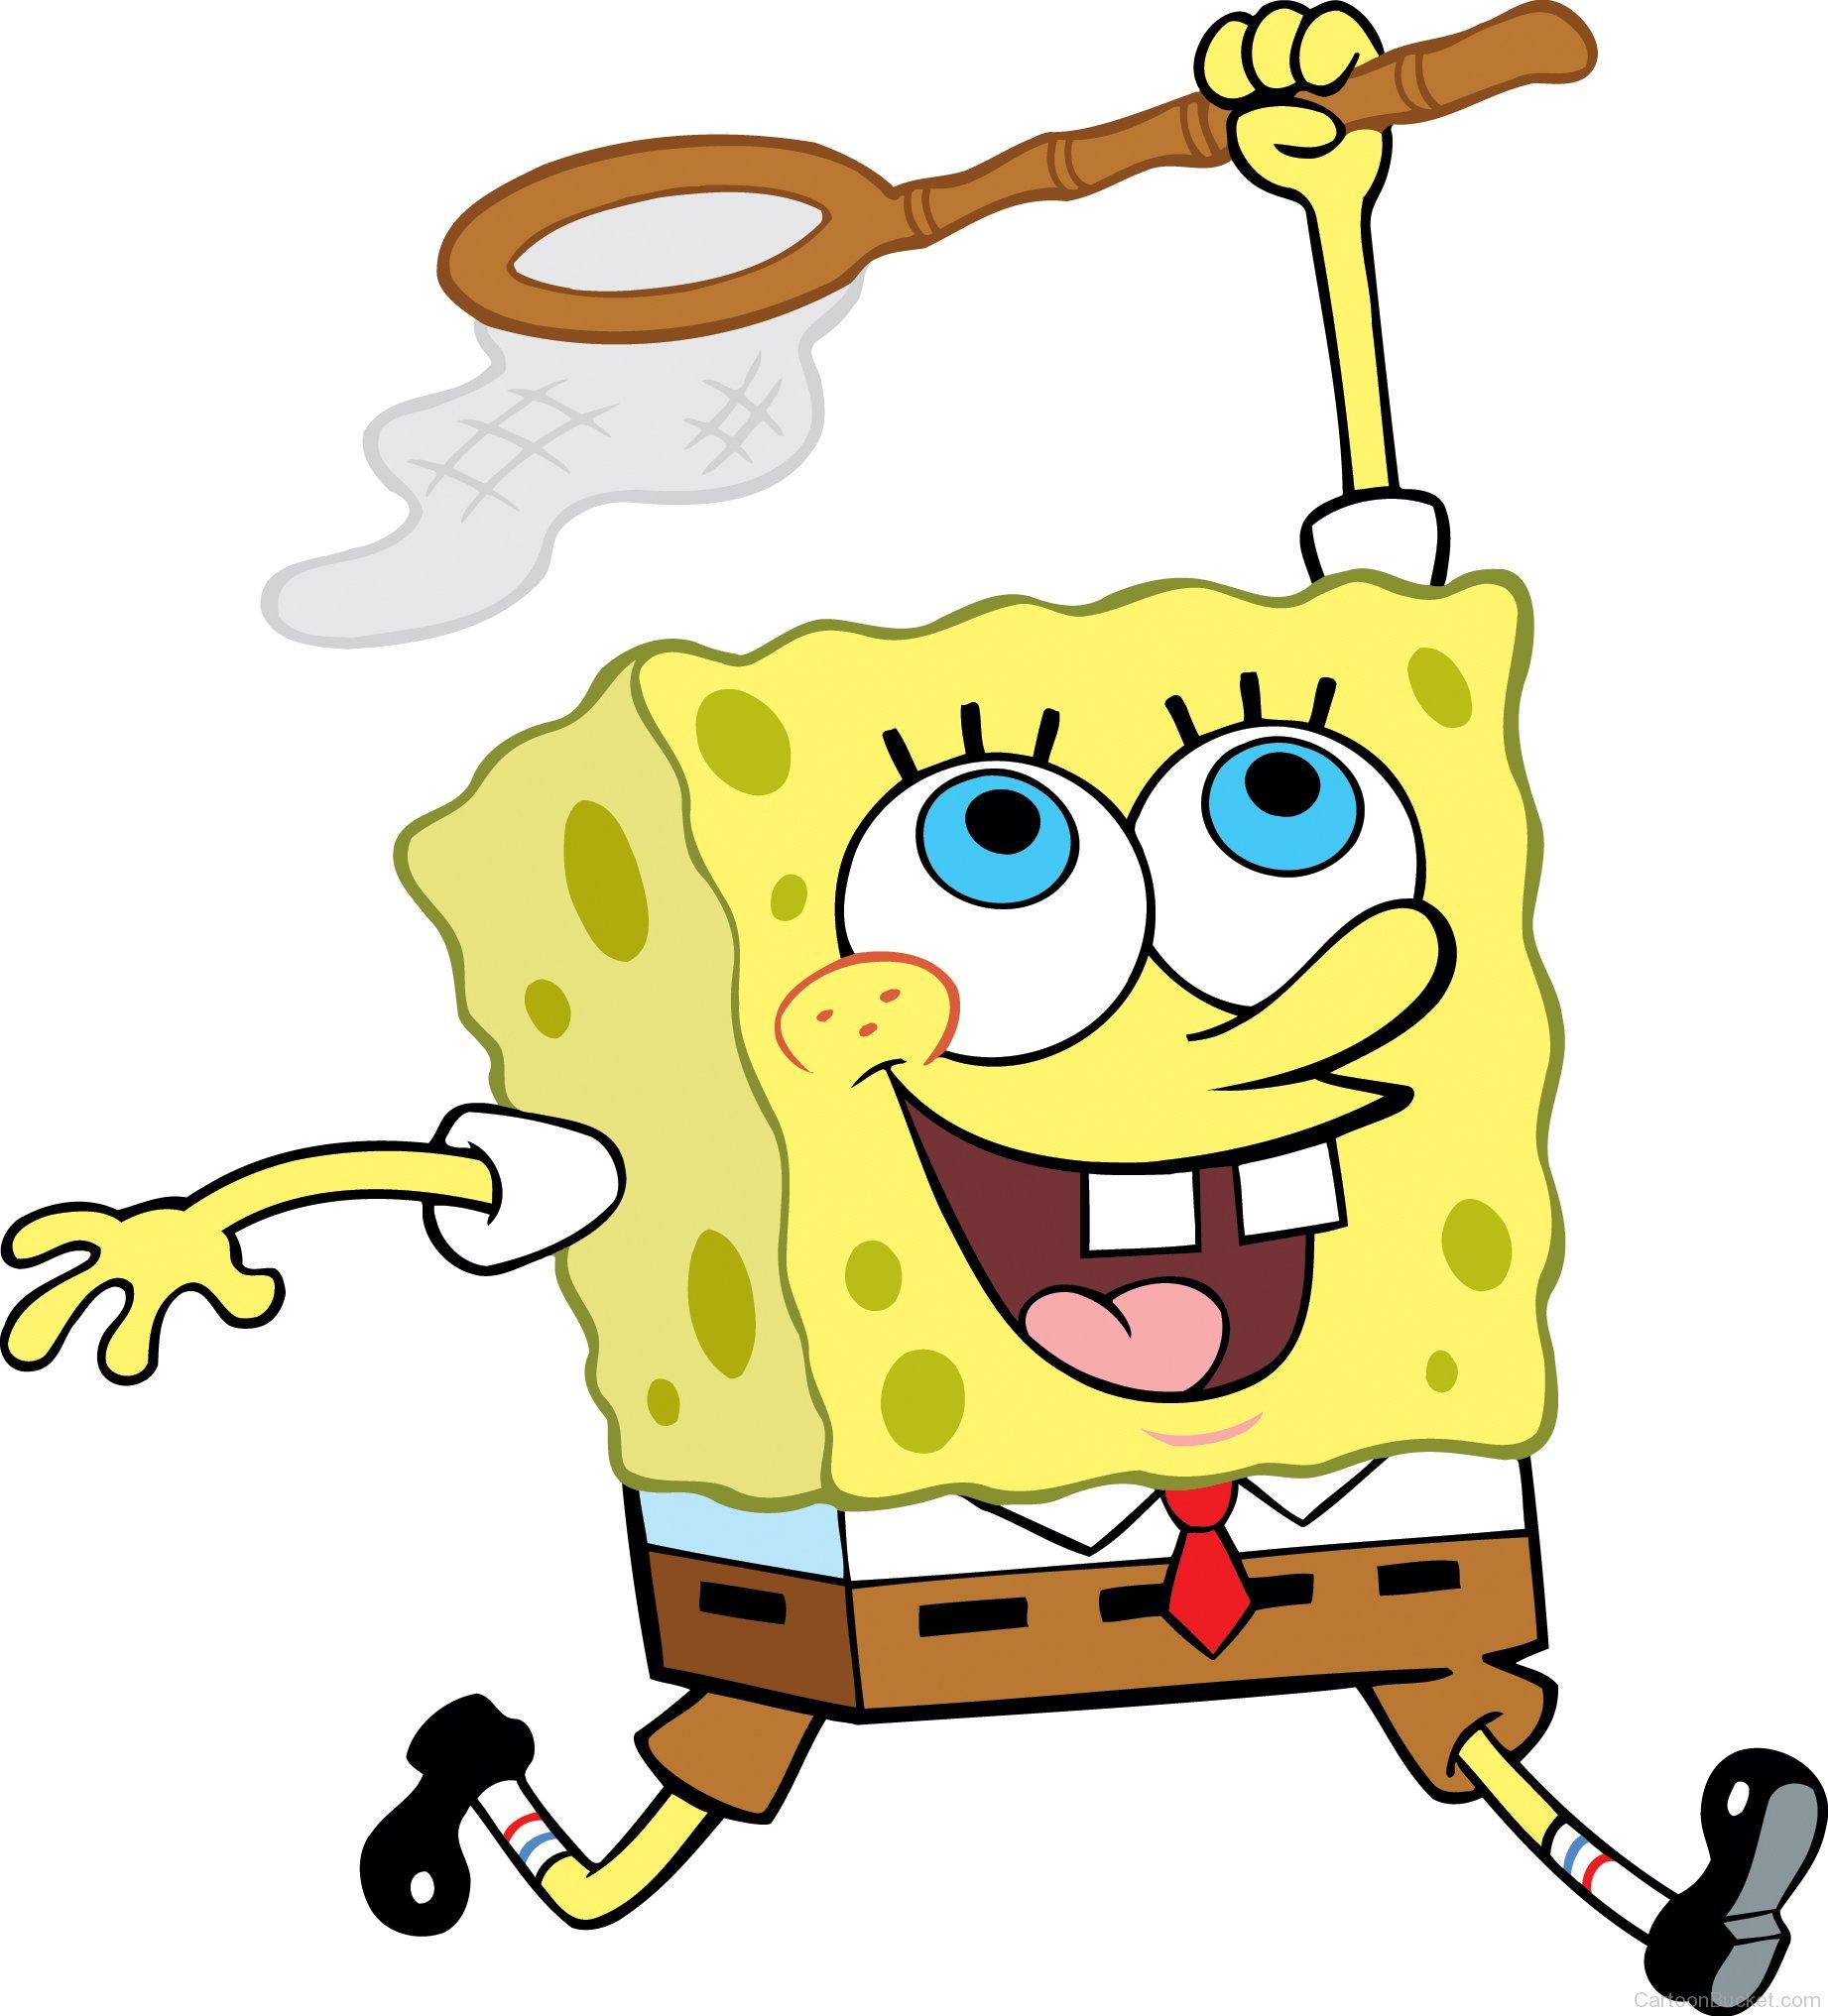 https://www.cartoonbucket.com/wp-content/uploads/2015/08/Spongebob-Holding-Net.jpg